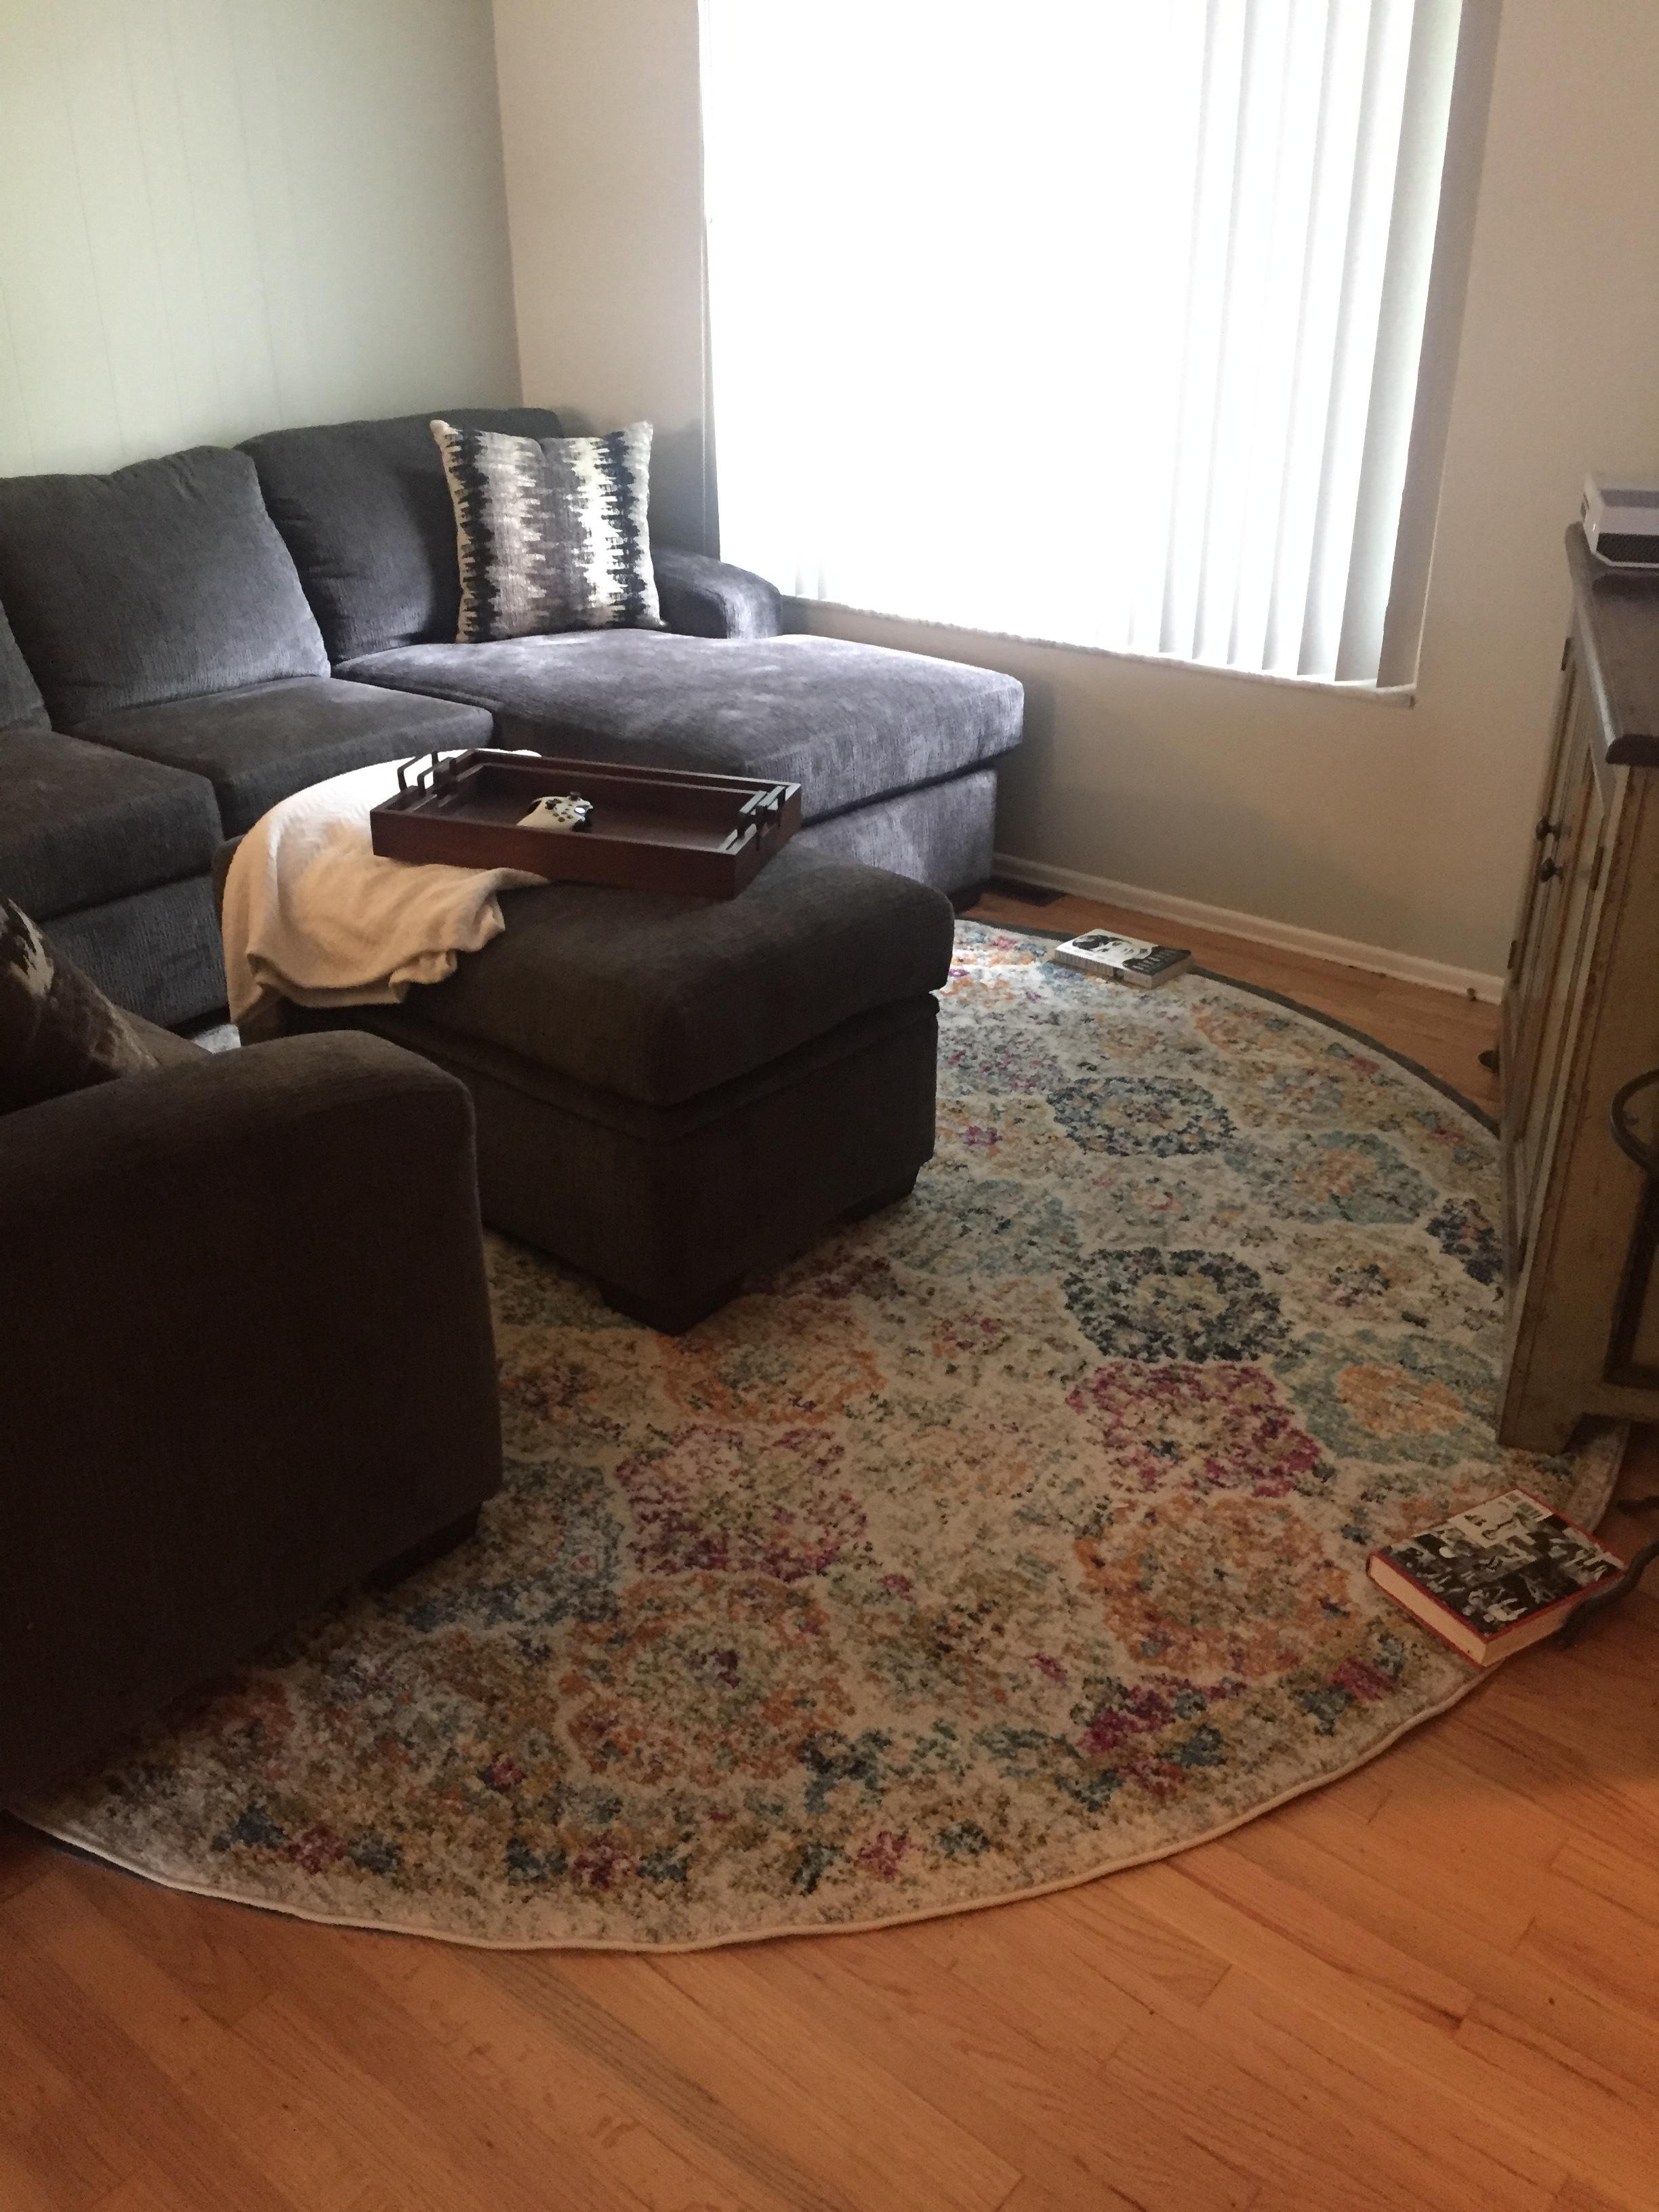 551 South Trenton Living Room.JPG